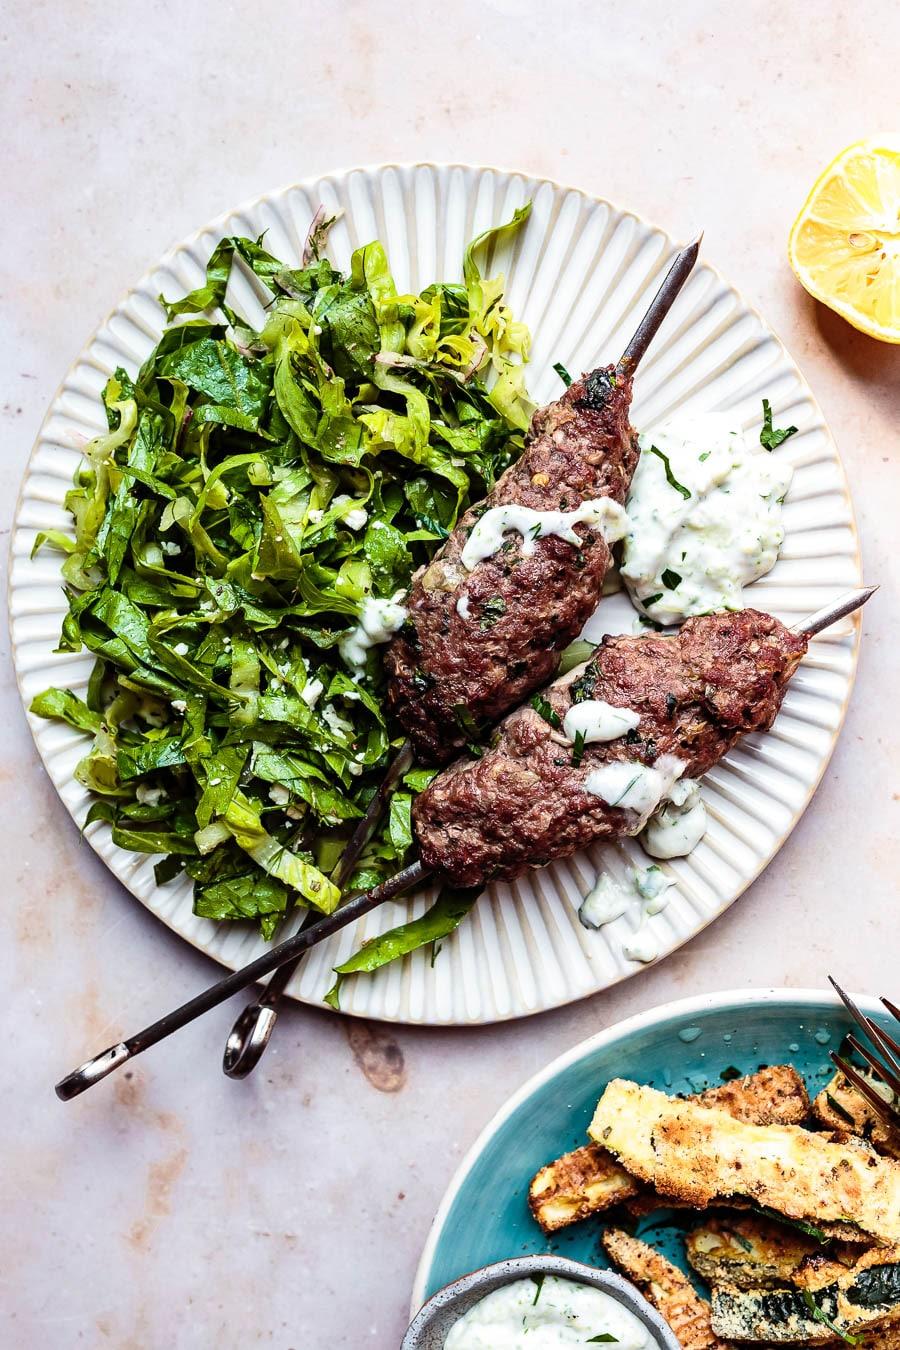 baked greek kofta kebabs with green salad and tzatziki on a plate